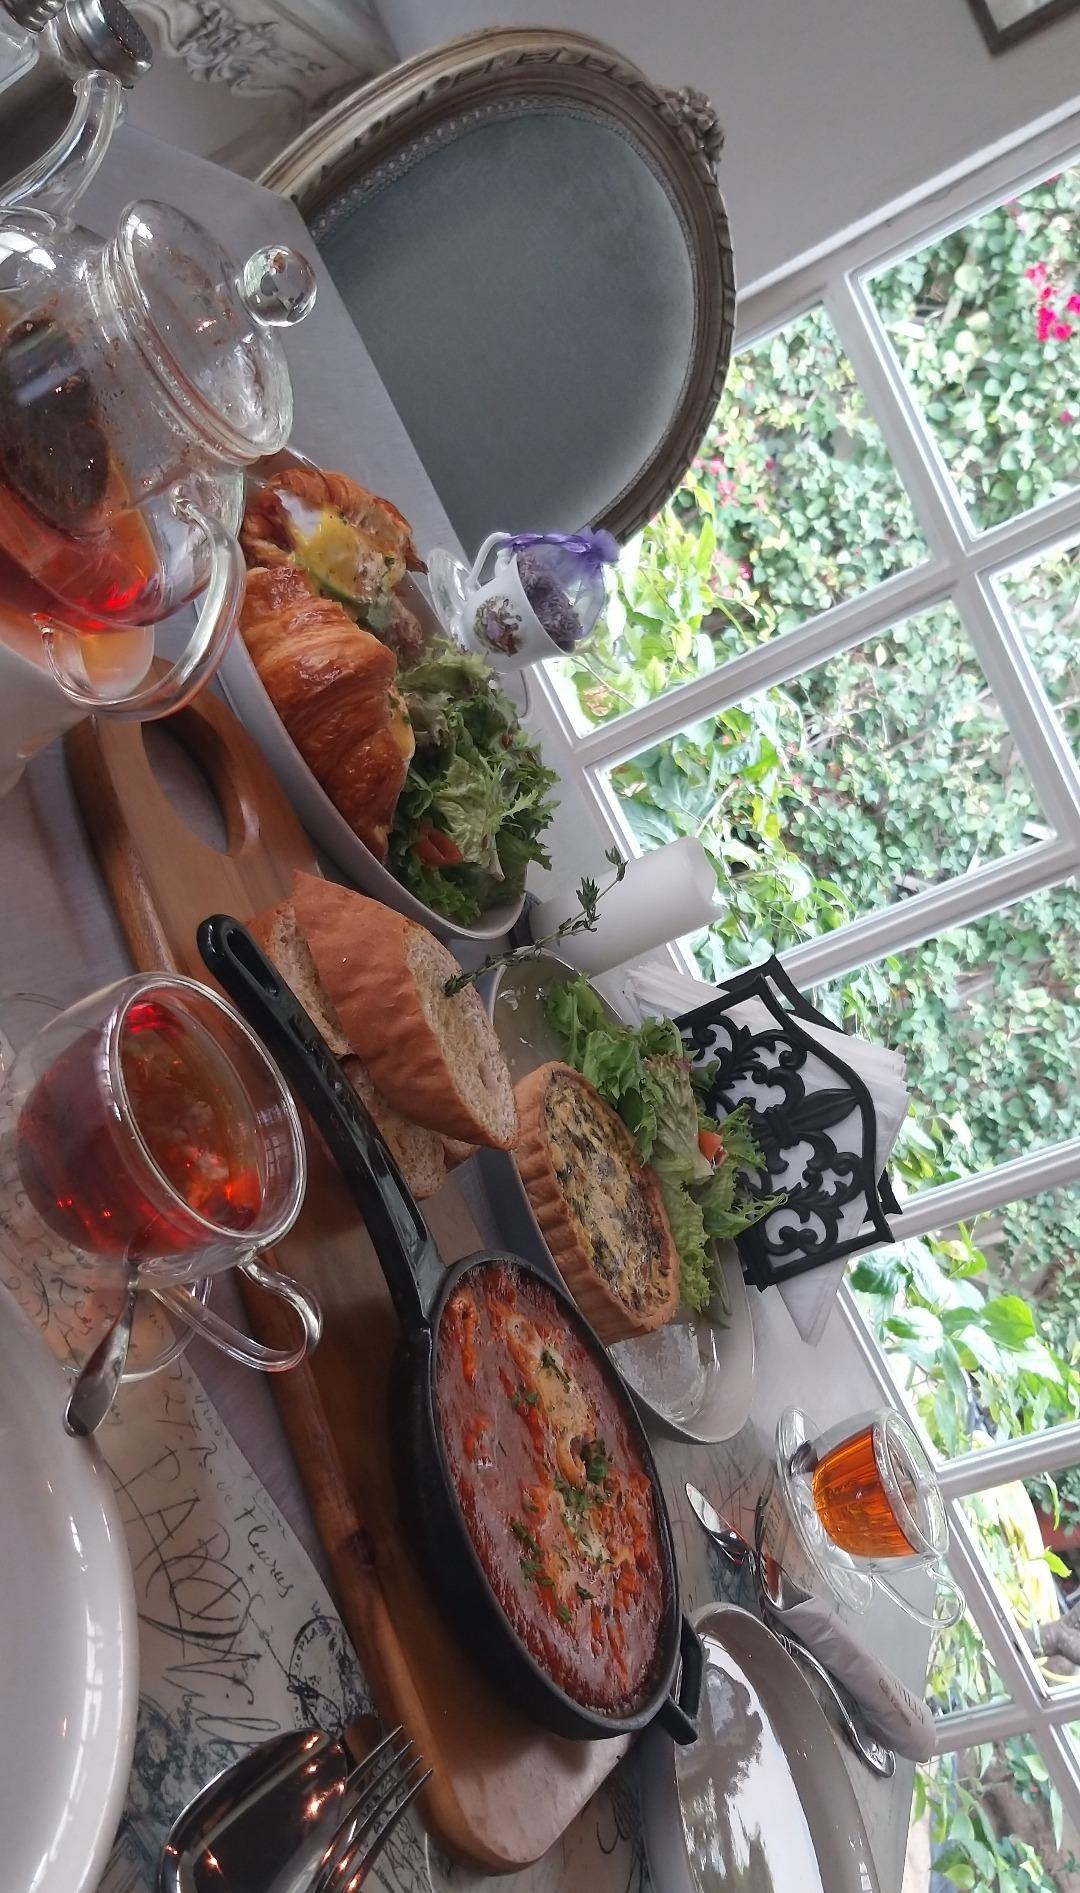 👌�👌�👌�👌� @ Cafe Chantilly - Bahrain